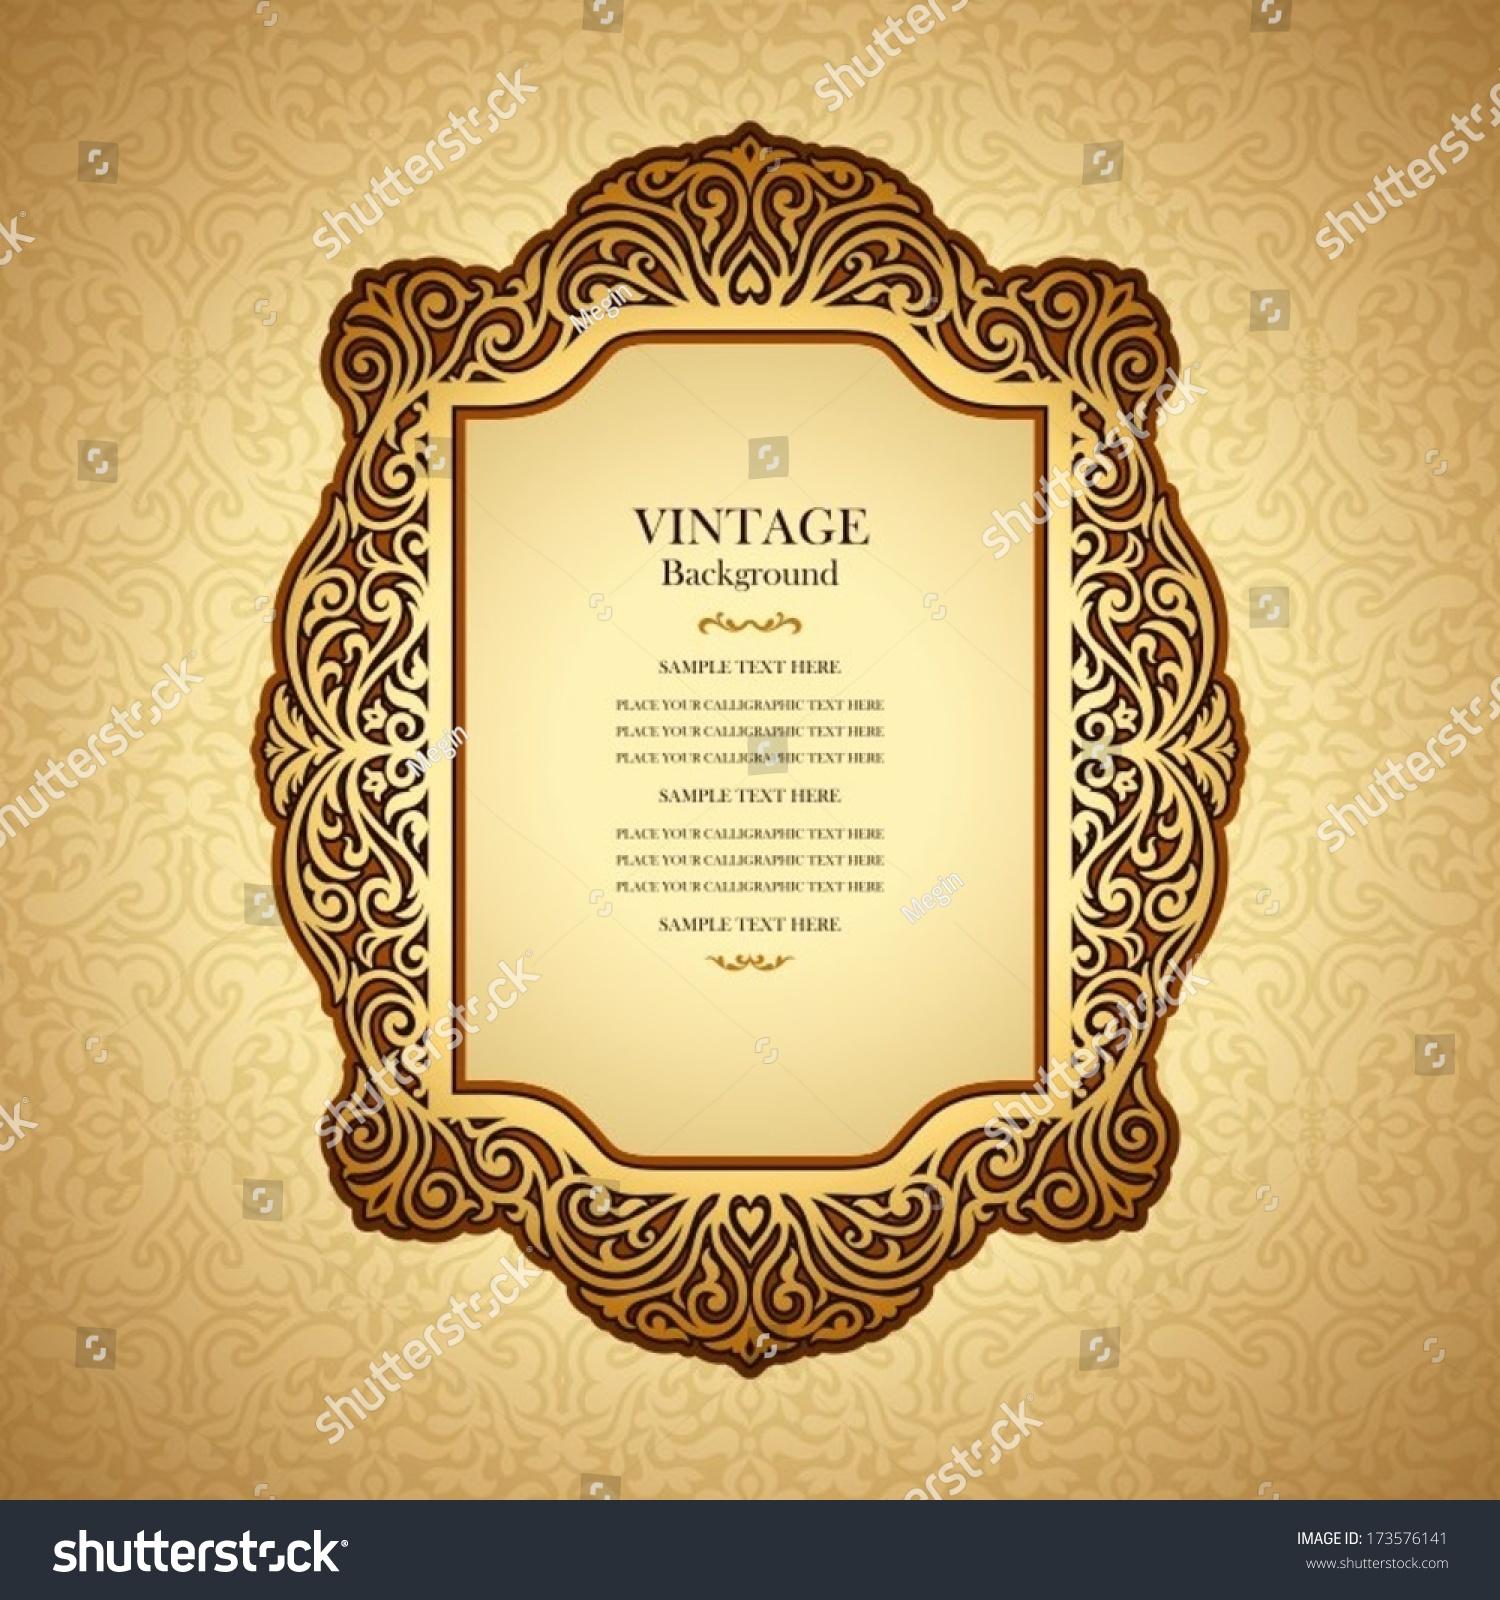 Vintage Book Cover Invitations : Vintage background design elegant book cover stock vector